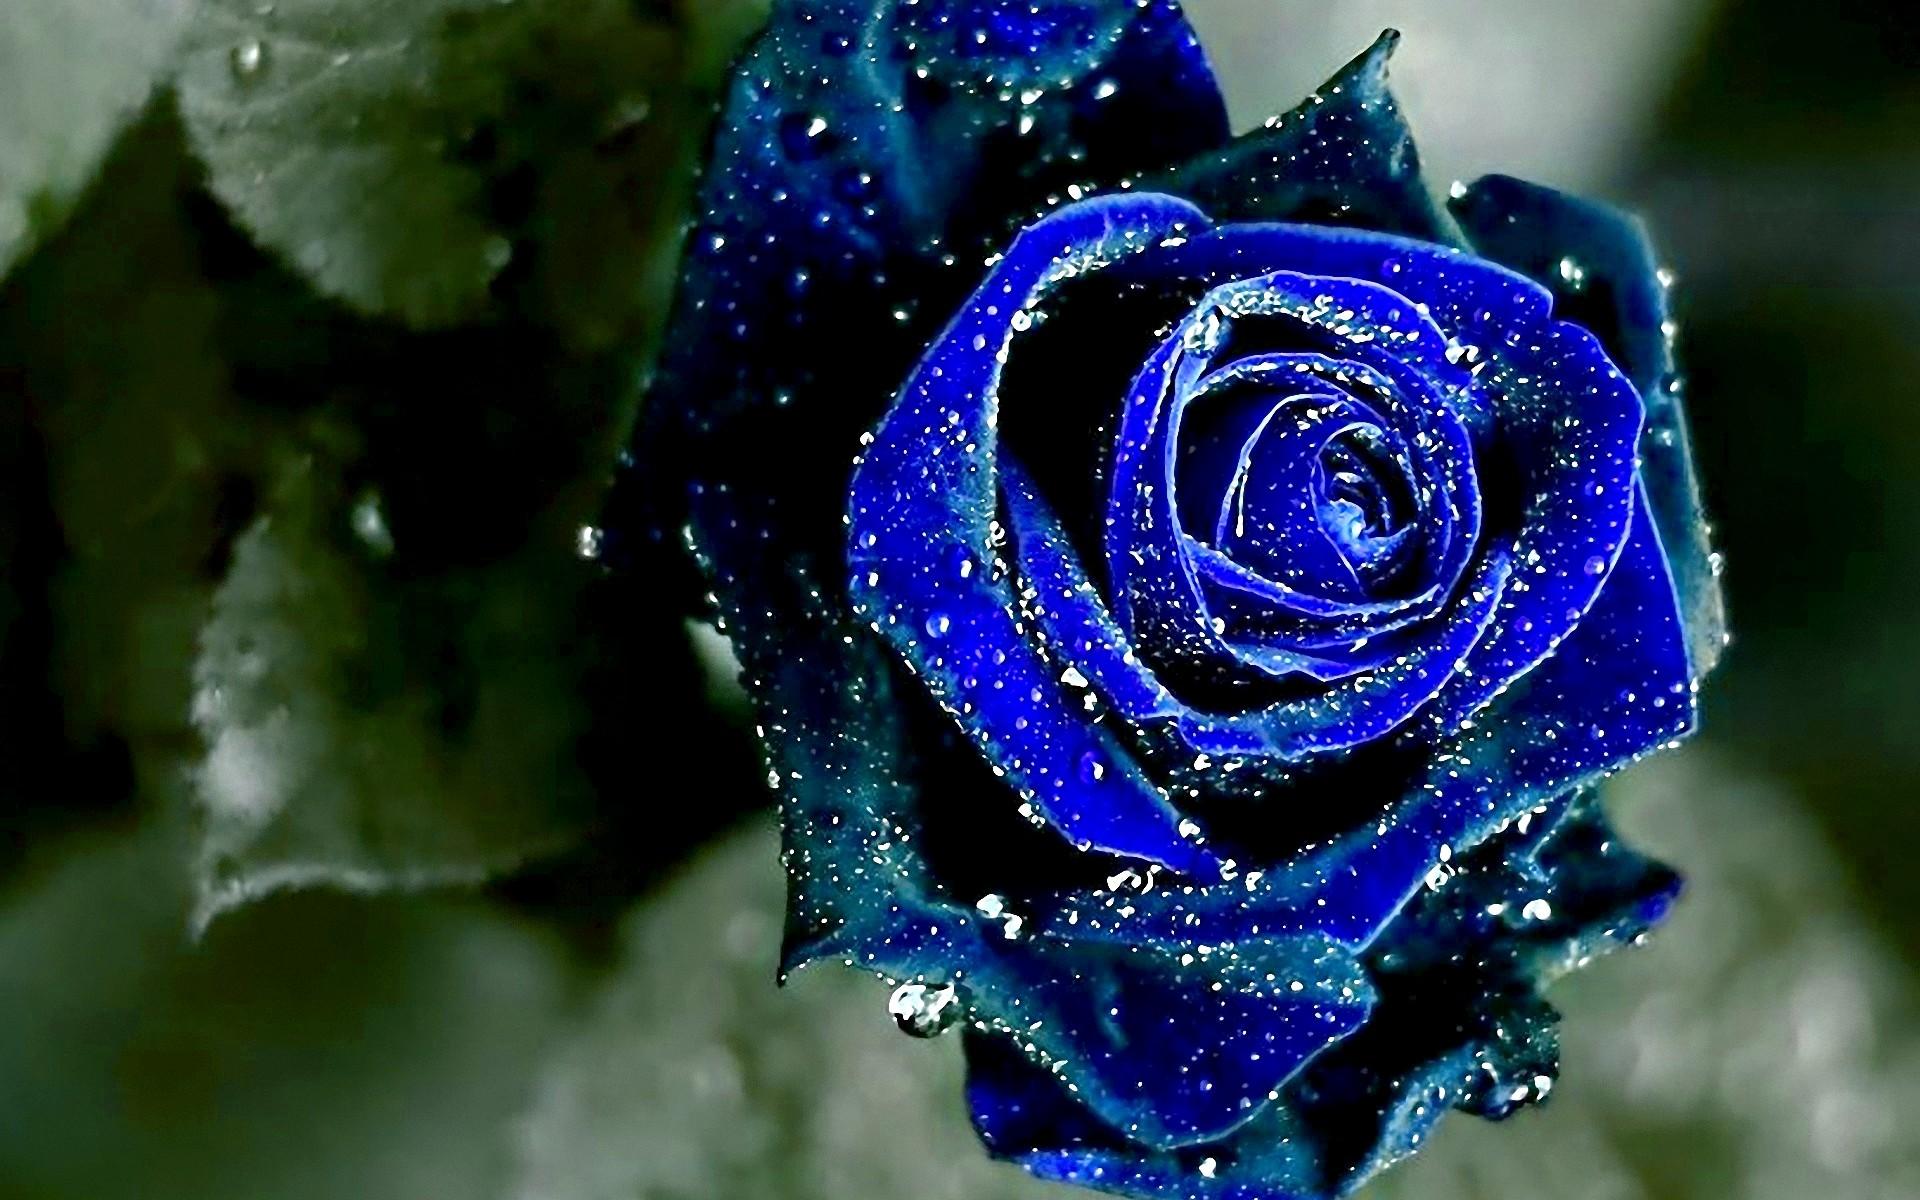 Blue Roses Background (48+ images)